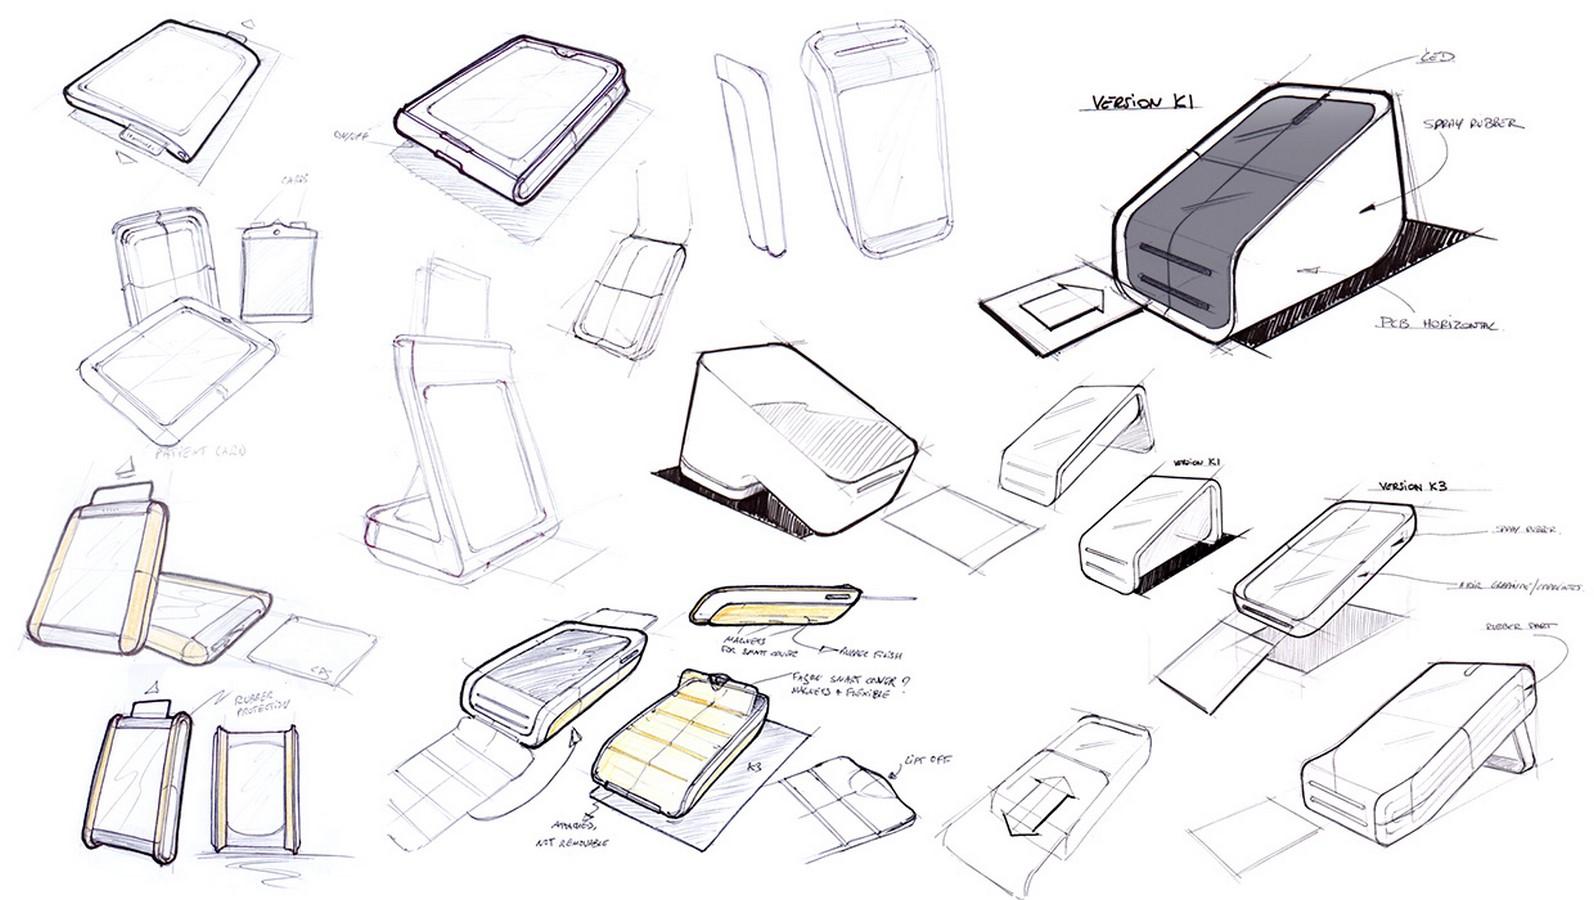 Sequoia-studio- 10 Iconic Products - Sheet22